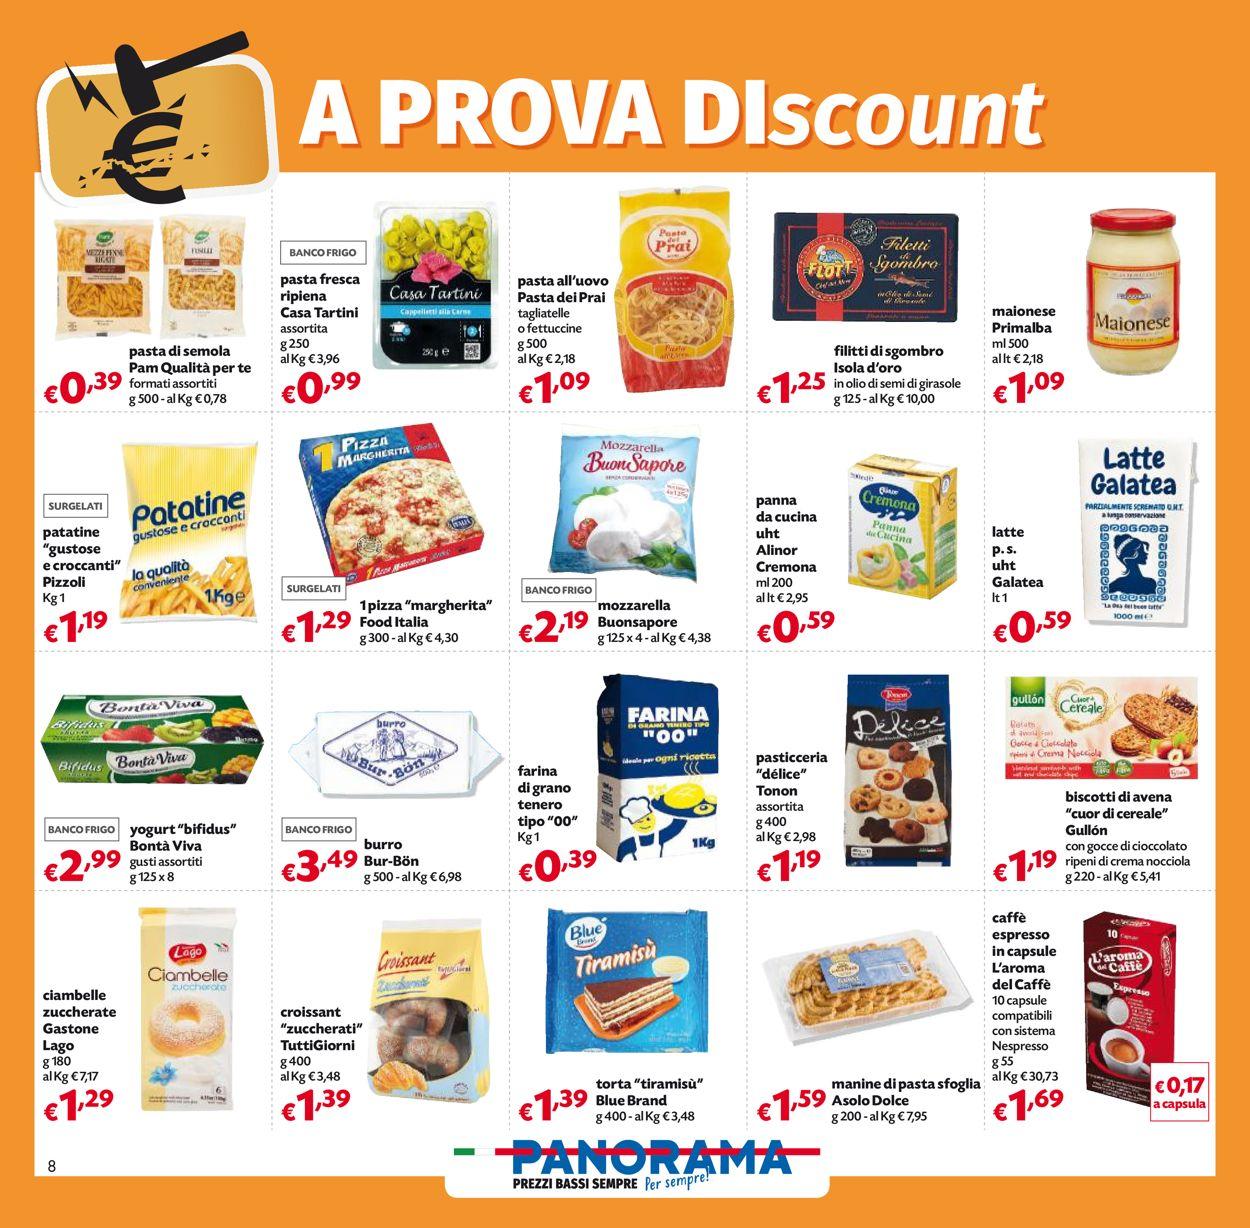 Volantino Pam Panorama - Offerte 06/04-21/04/2021 (Pagina 8)